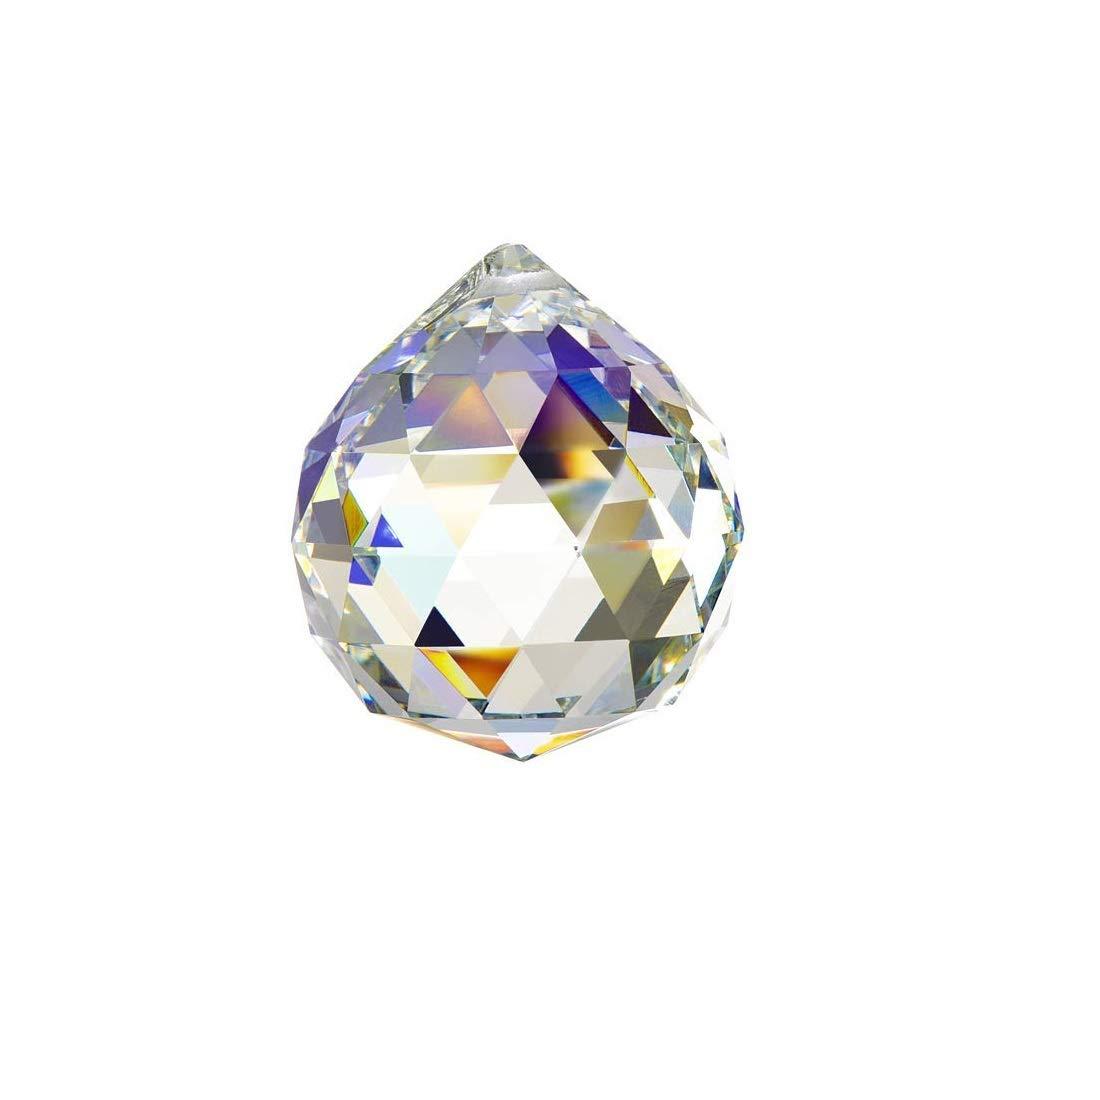 SET OF THREE  Doloburn 40mm Large Crystal Ball Prism Pendant